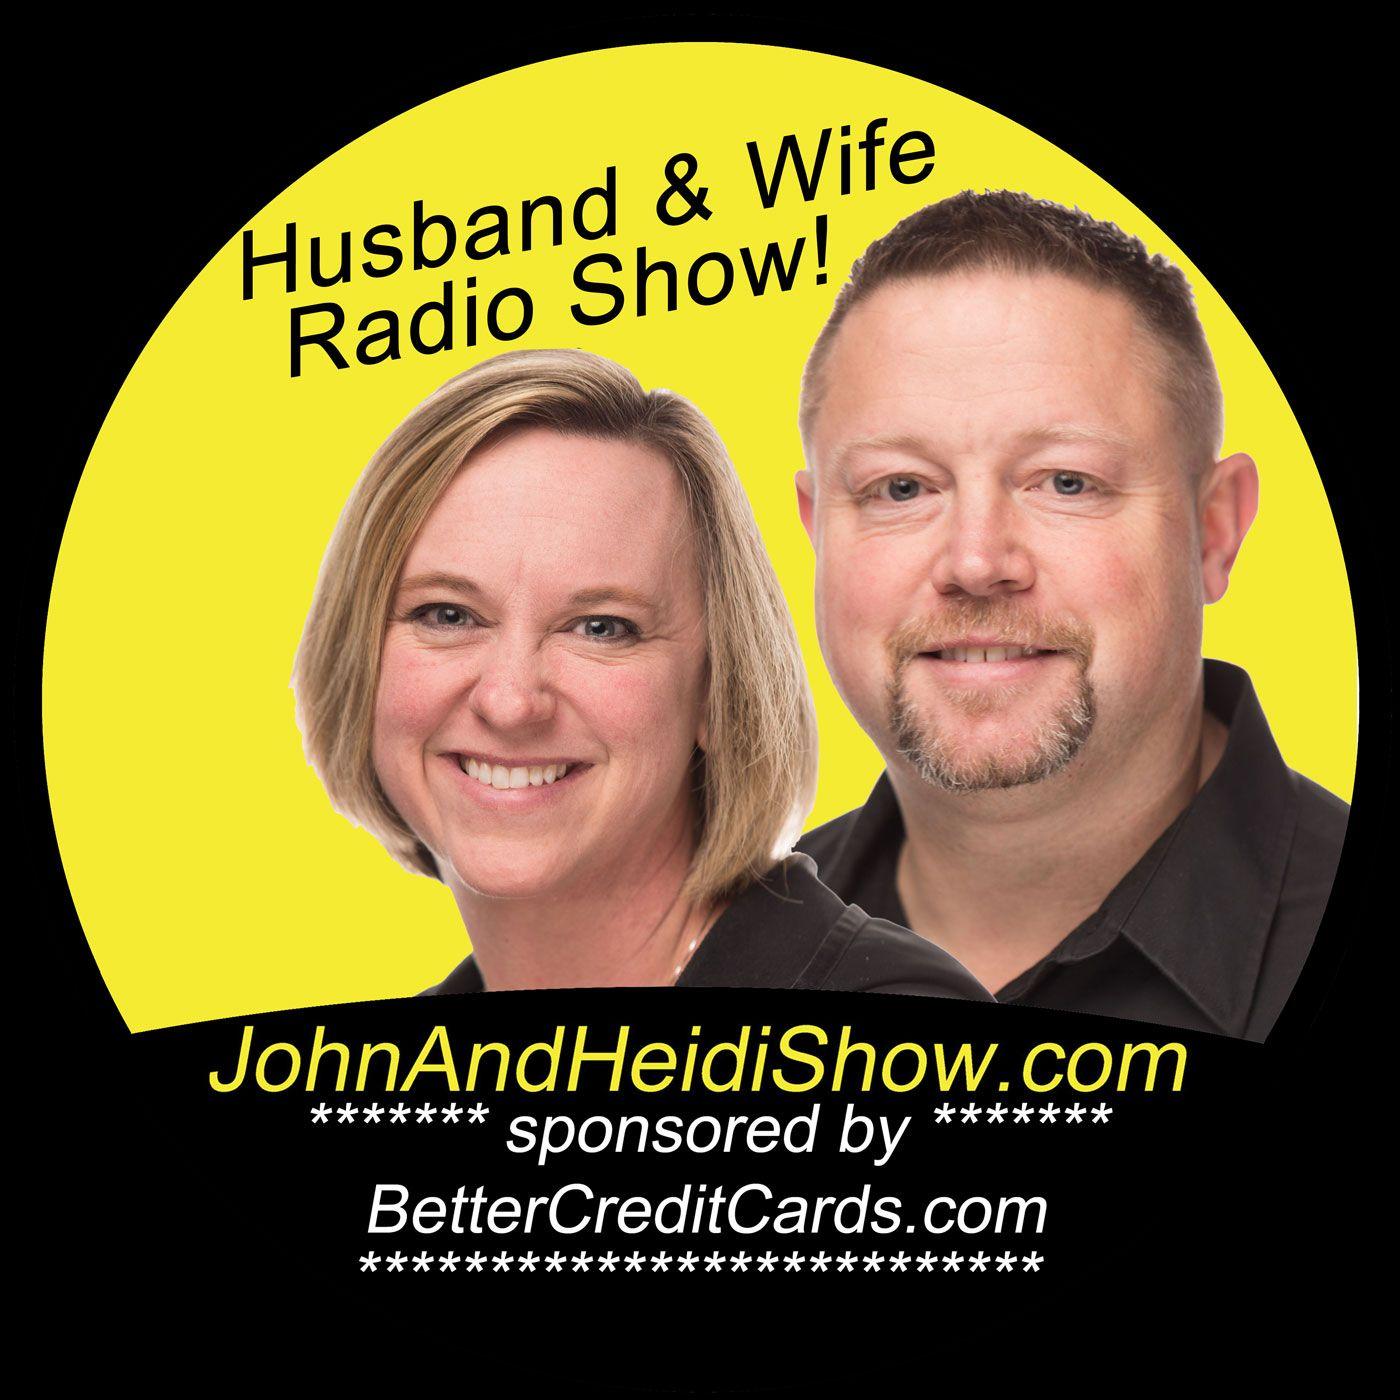 The John & Heidi Show